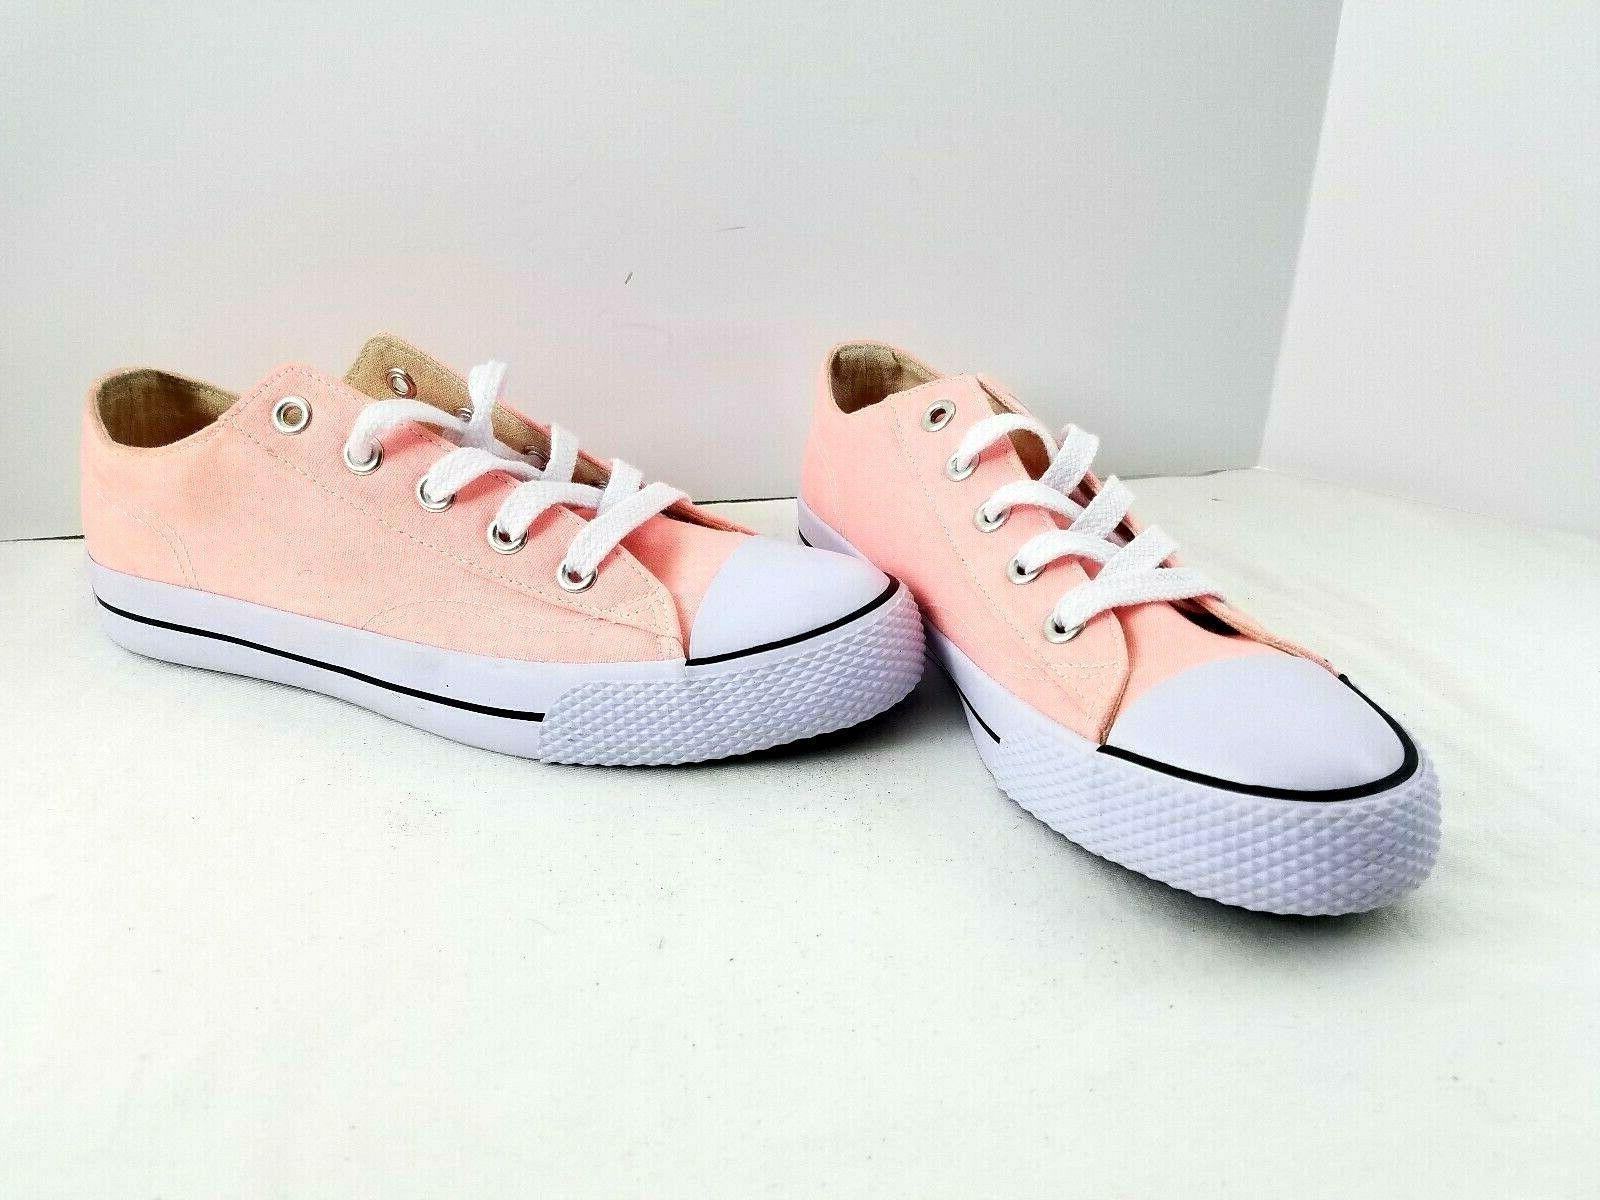 Airwalk Sneakers Pink White multiple sizes New